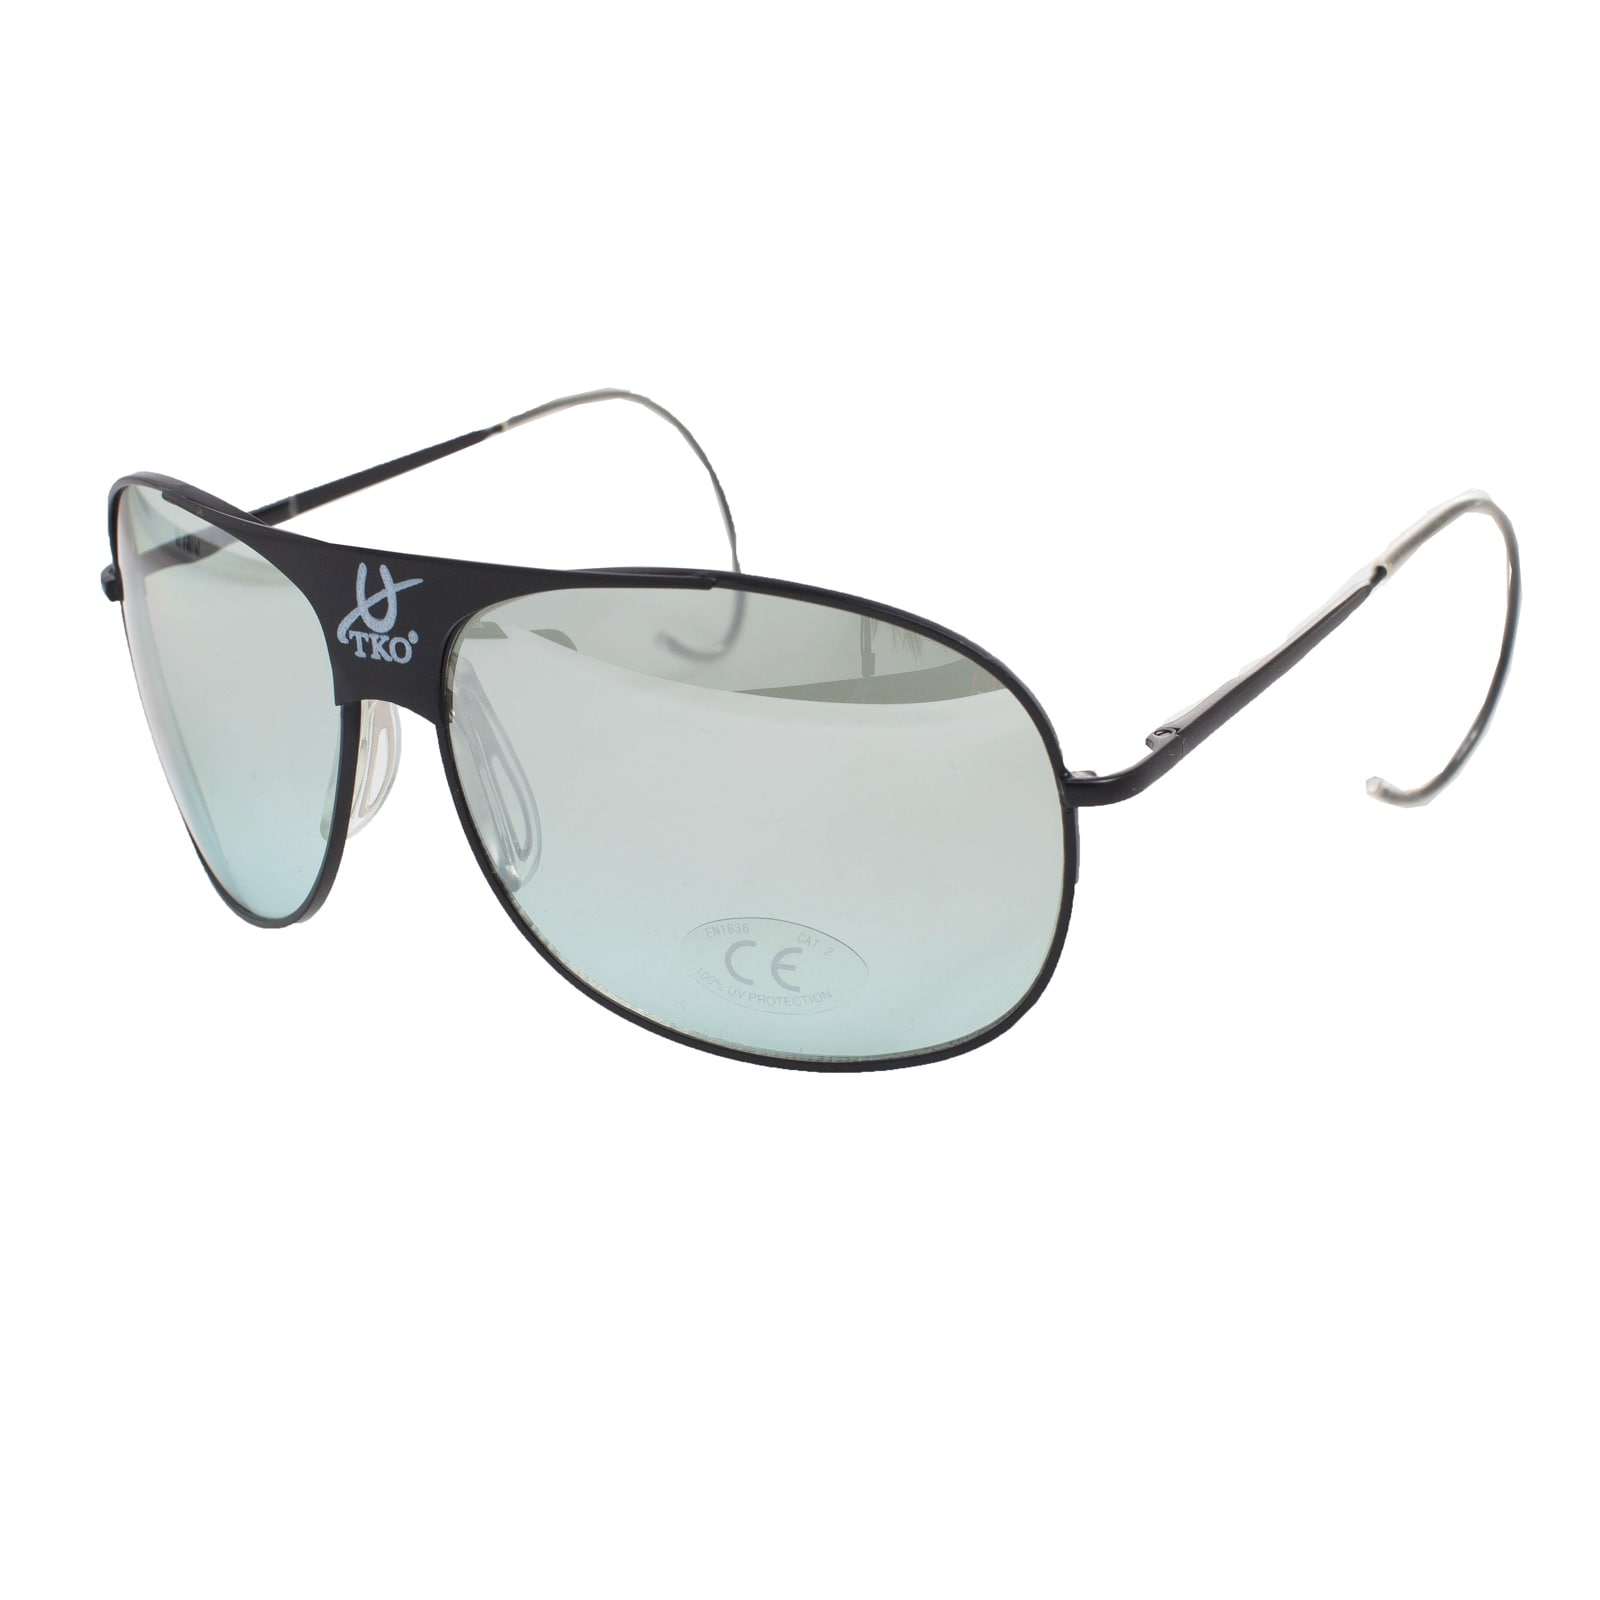 TKO Harness løpsbriller, sporty modell